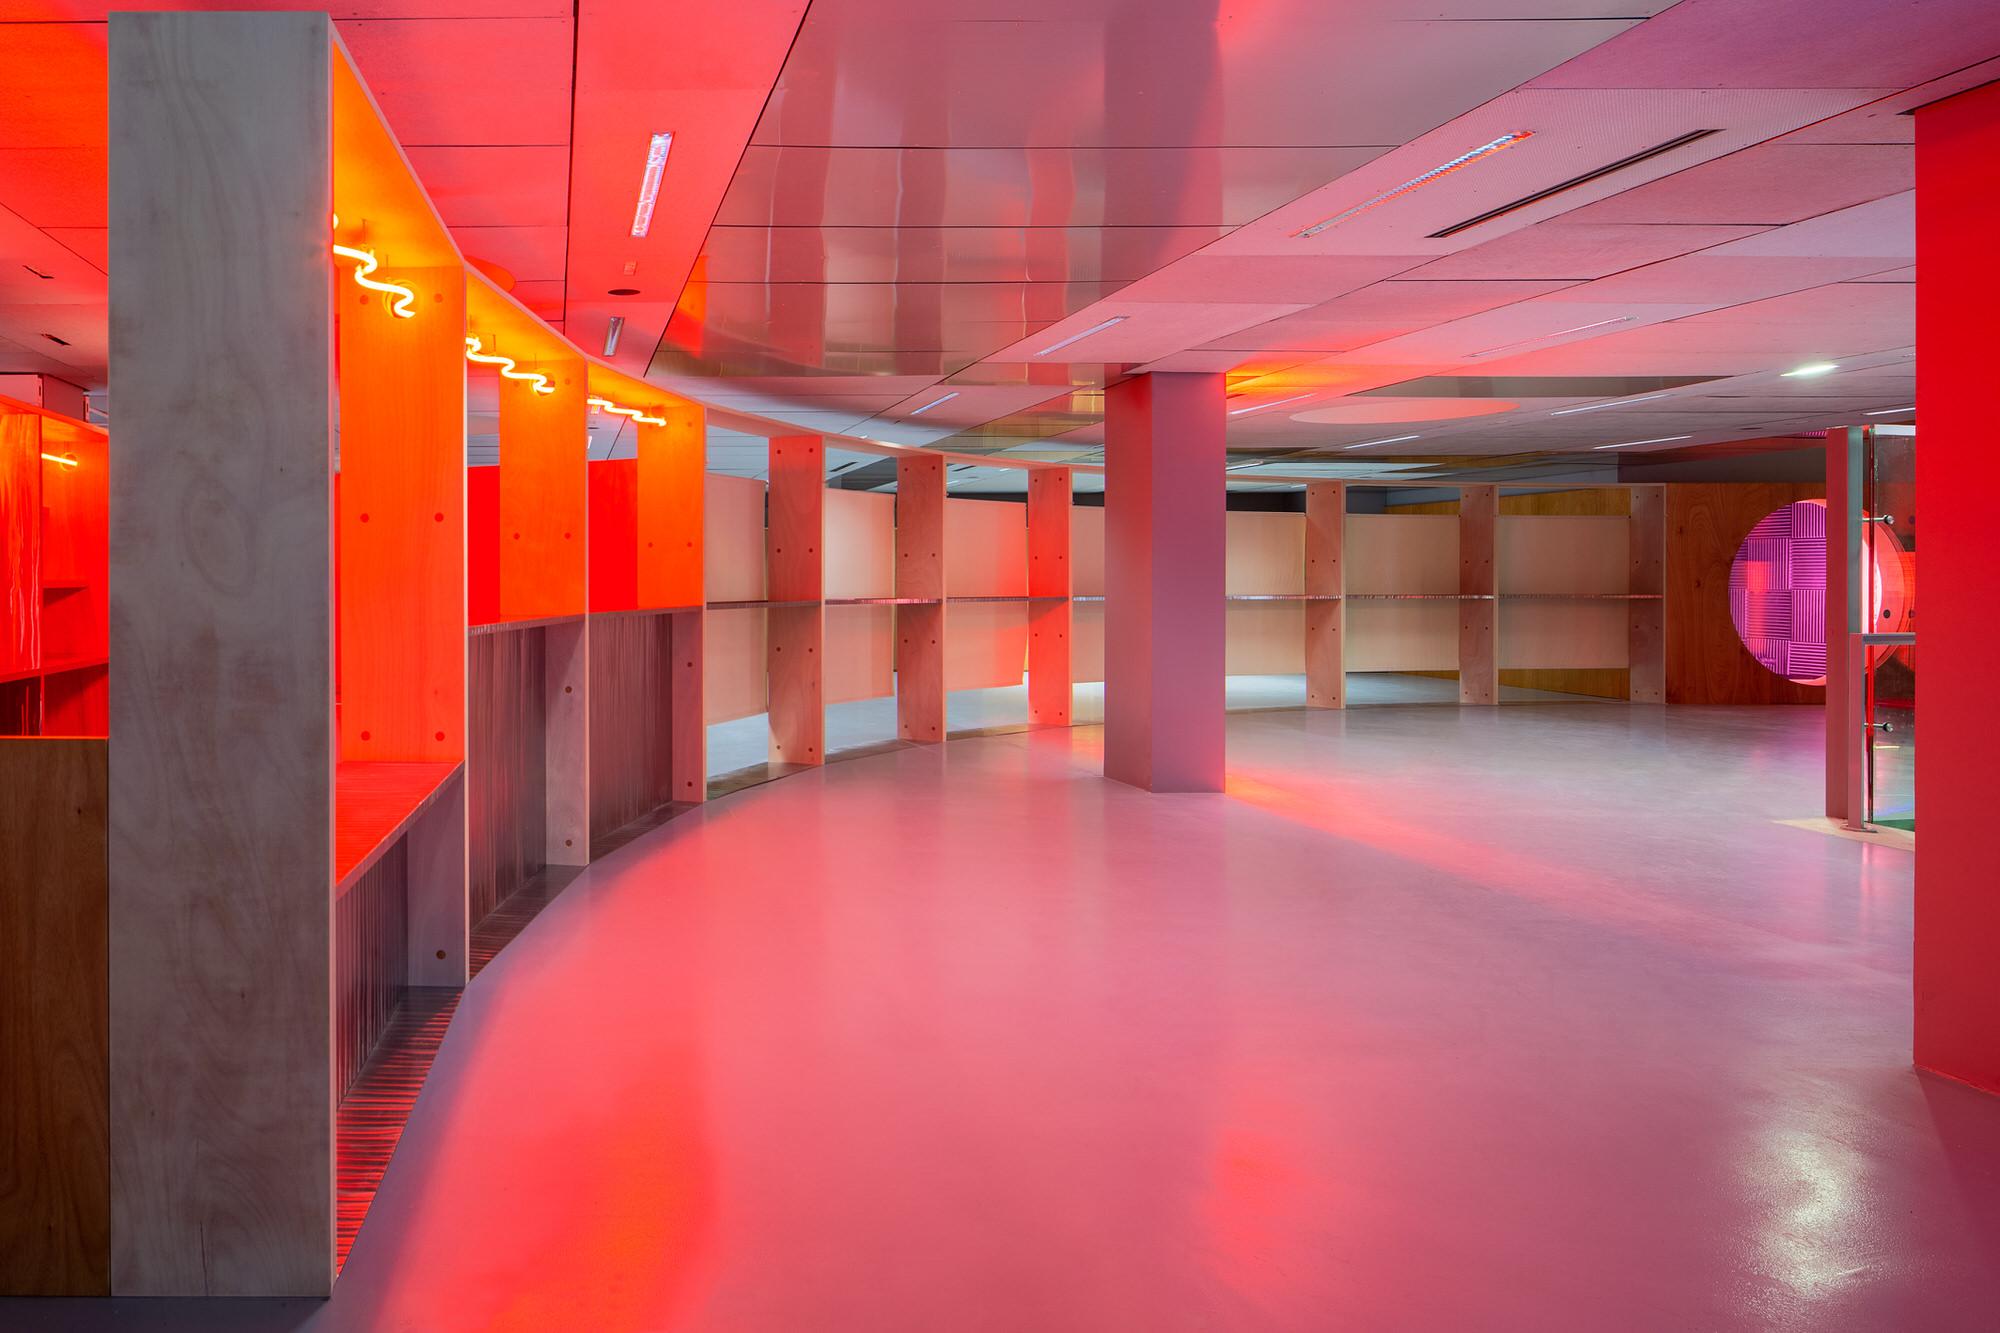 Jean Benoit Vetillard Architecture R+1 Gaite Lyrique Multipurpose Space Paris Photo Giaime Meloni Yellowtrace 12